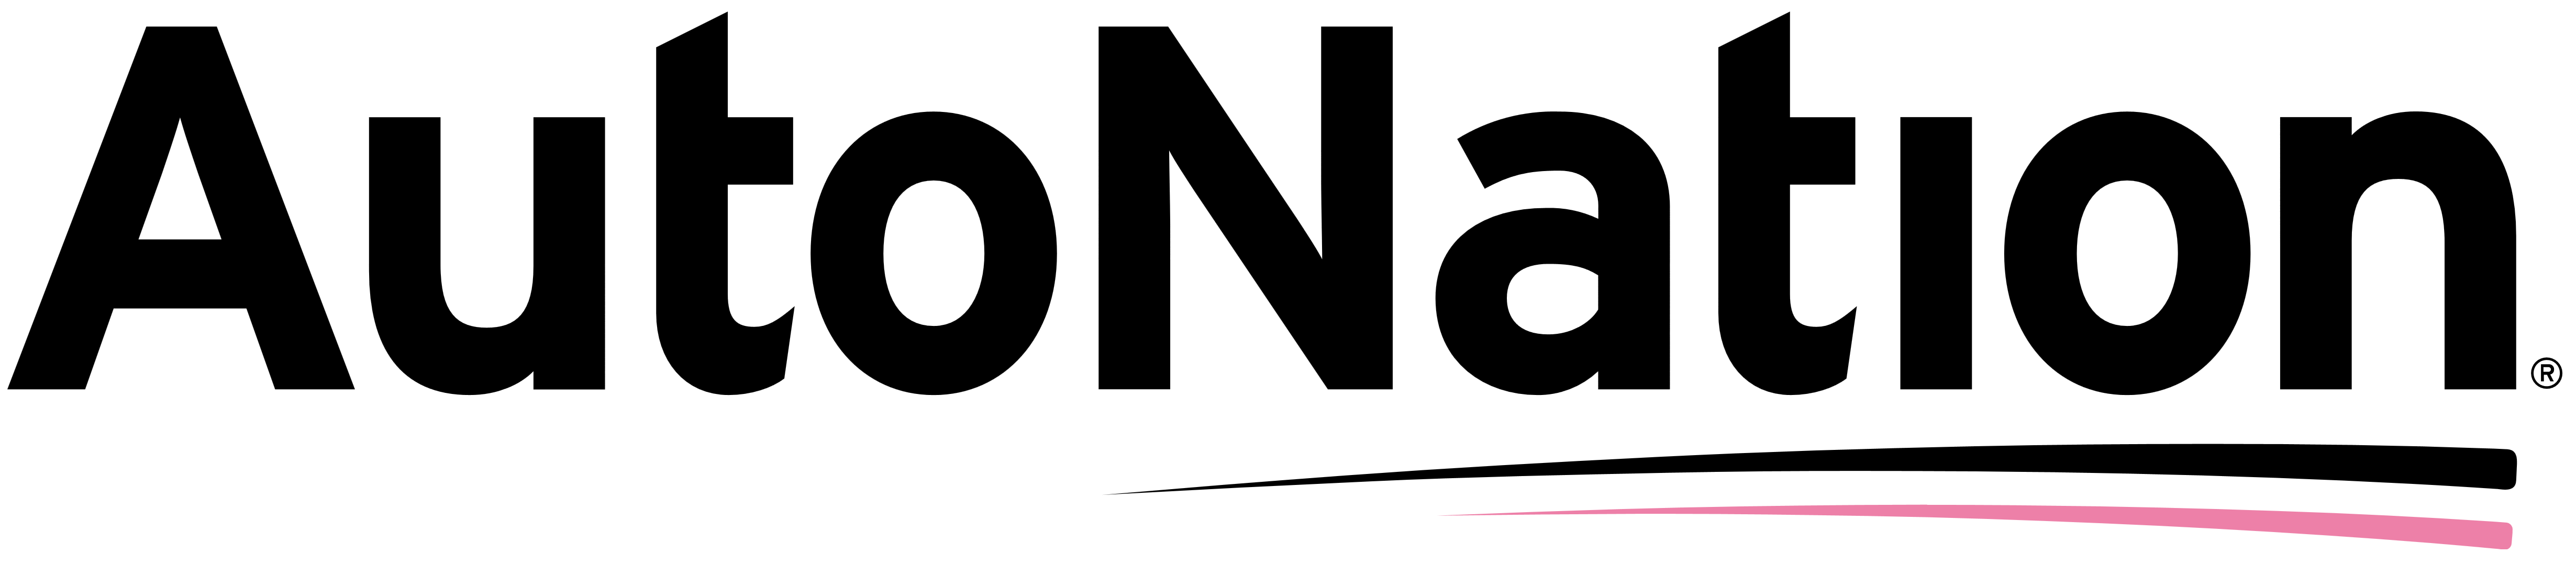 AutoNation – Logos Download